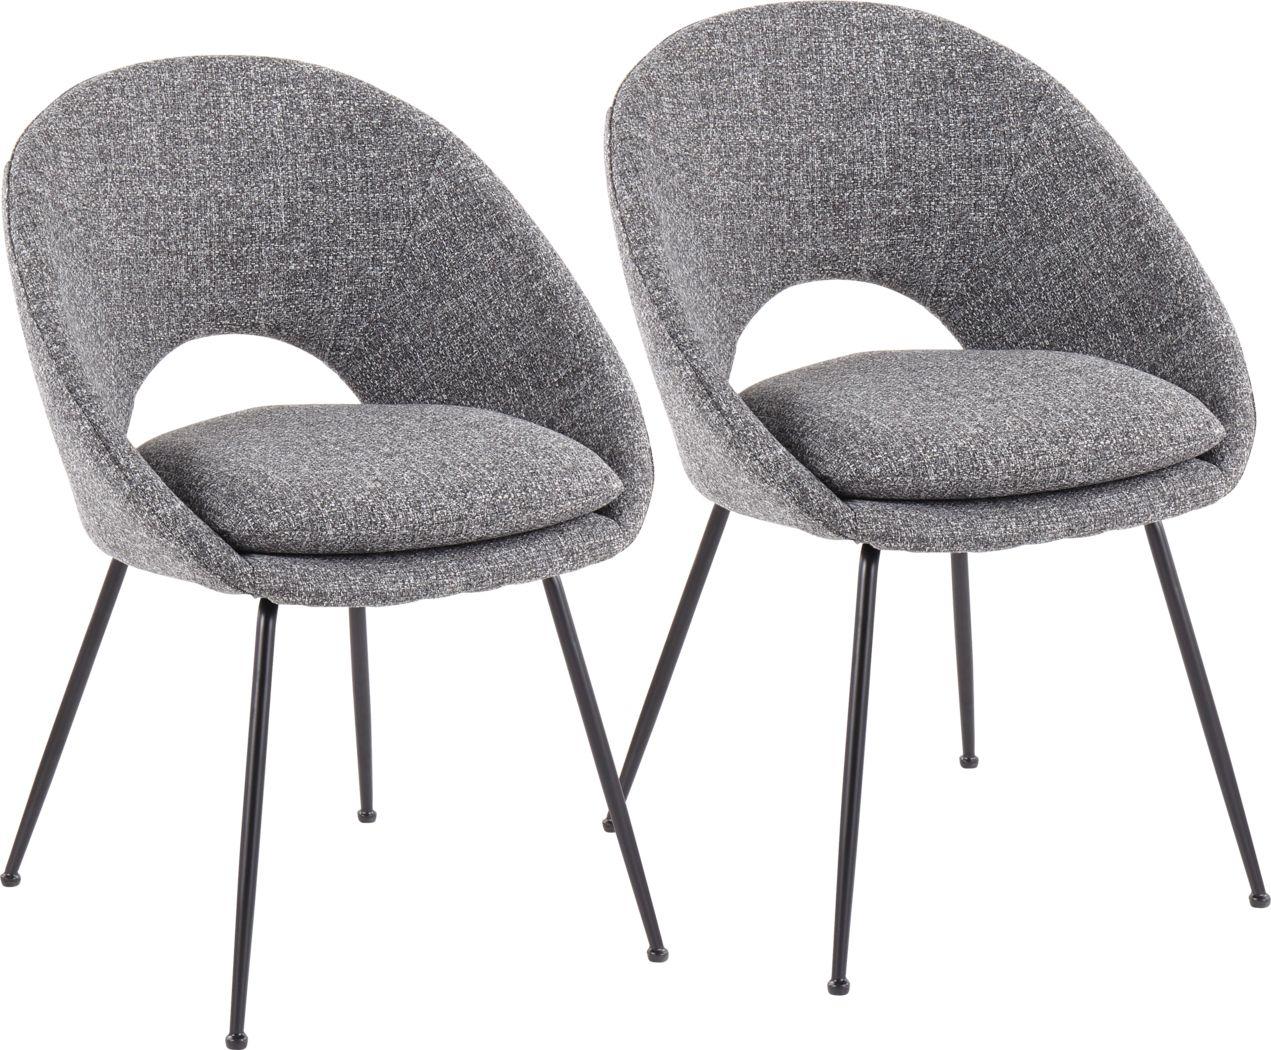 Kelann II Gray Dining Chair, Set of 2